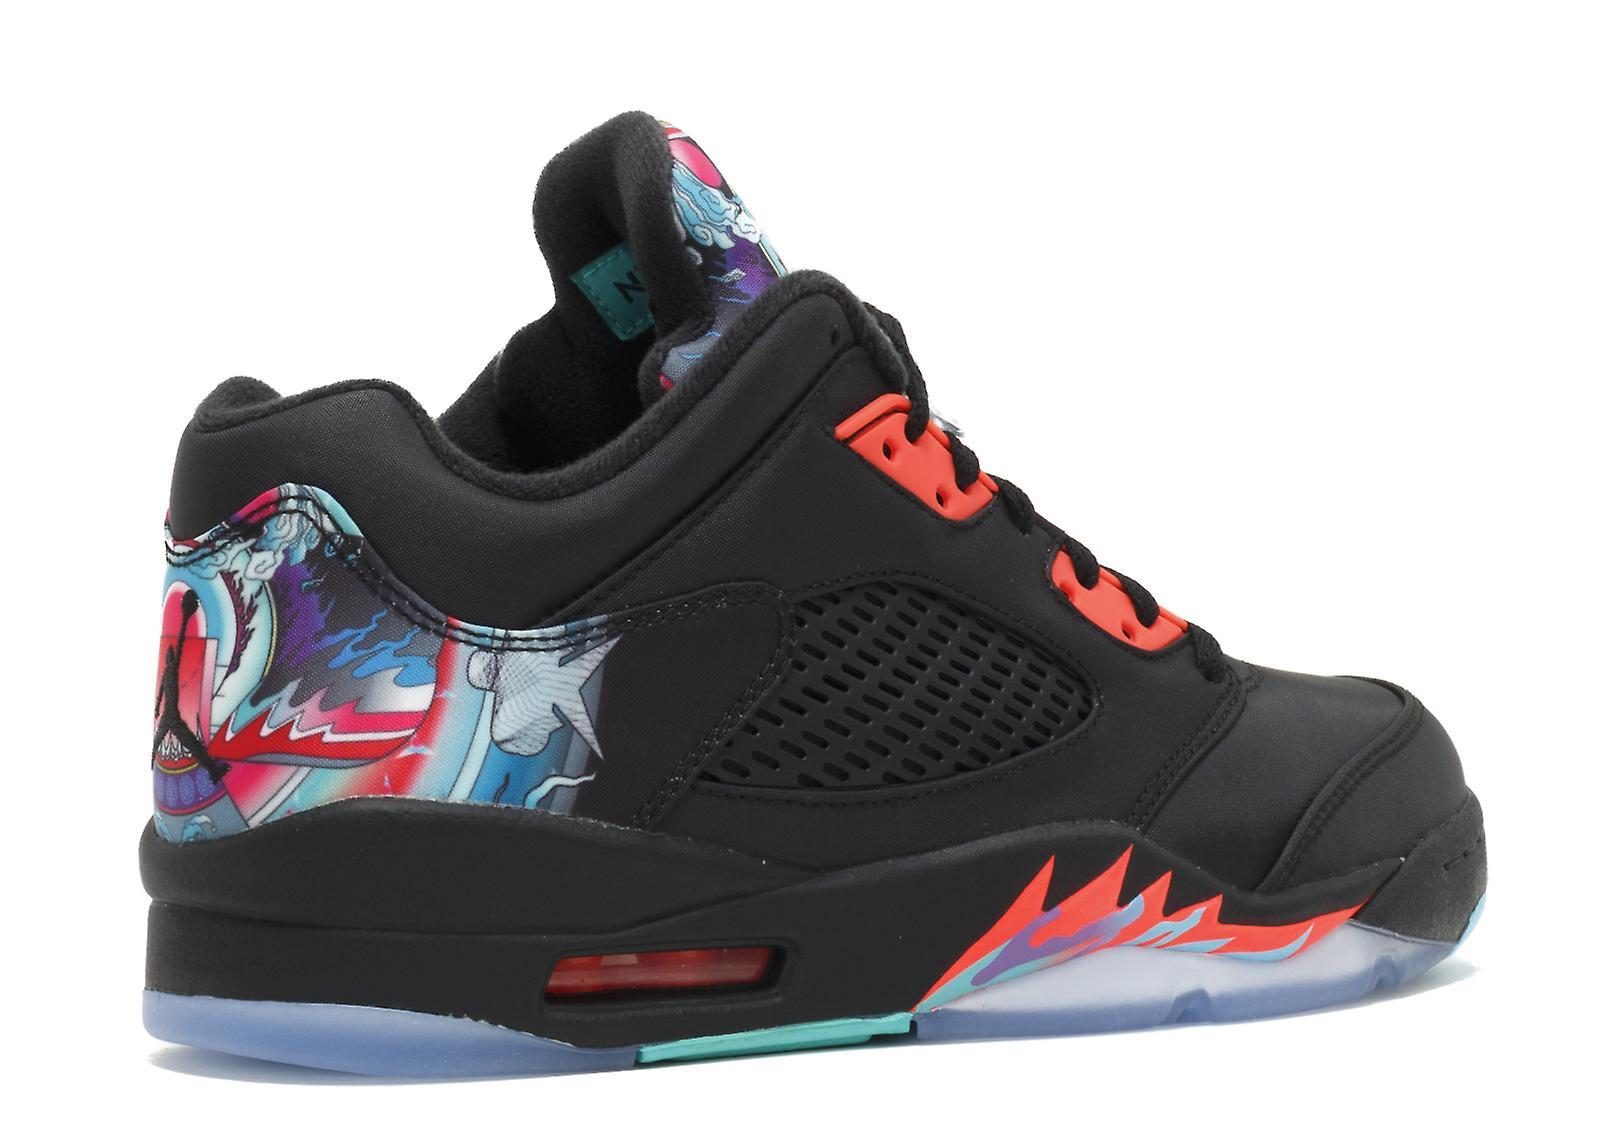 oryginalne buty Data wydania gorący produkt Air Jordan 5 Retro Low Cny 'Chinese New Year' - 840475-060 - Shoes